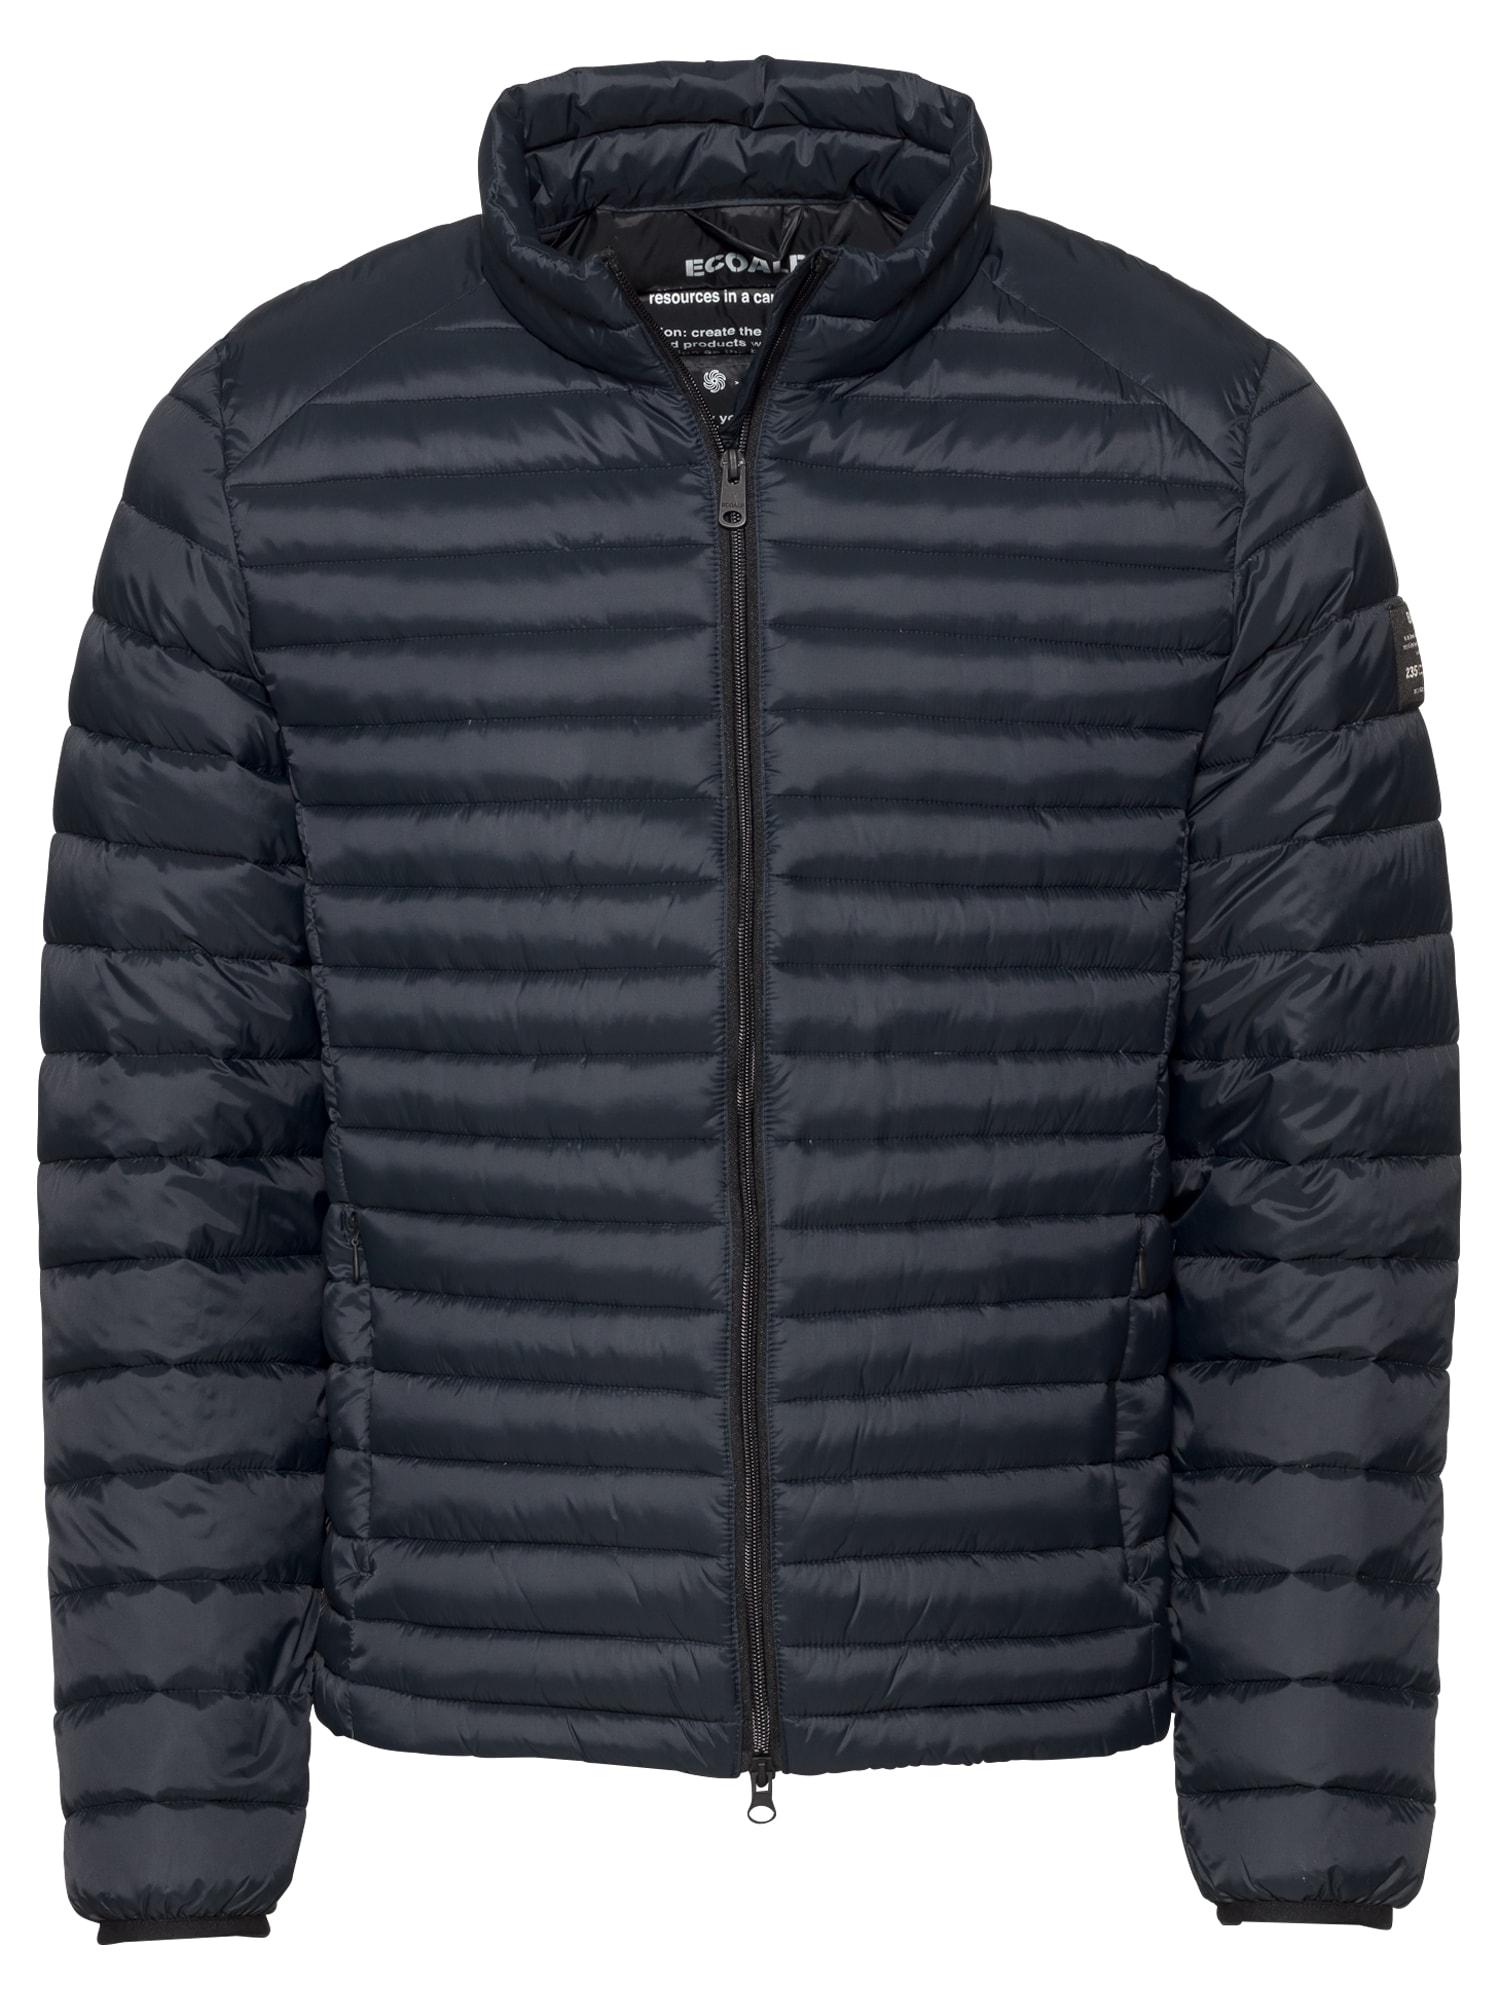 Přechodná bunda beret down jacket man tmavě modrá ECOALF